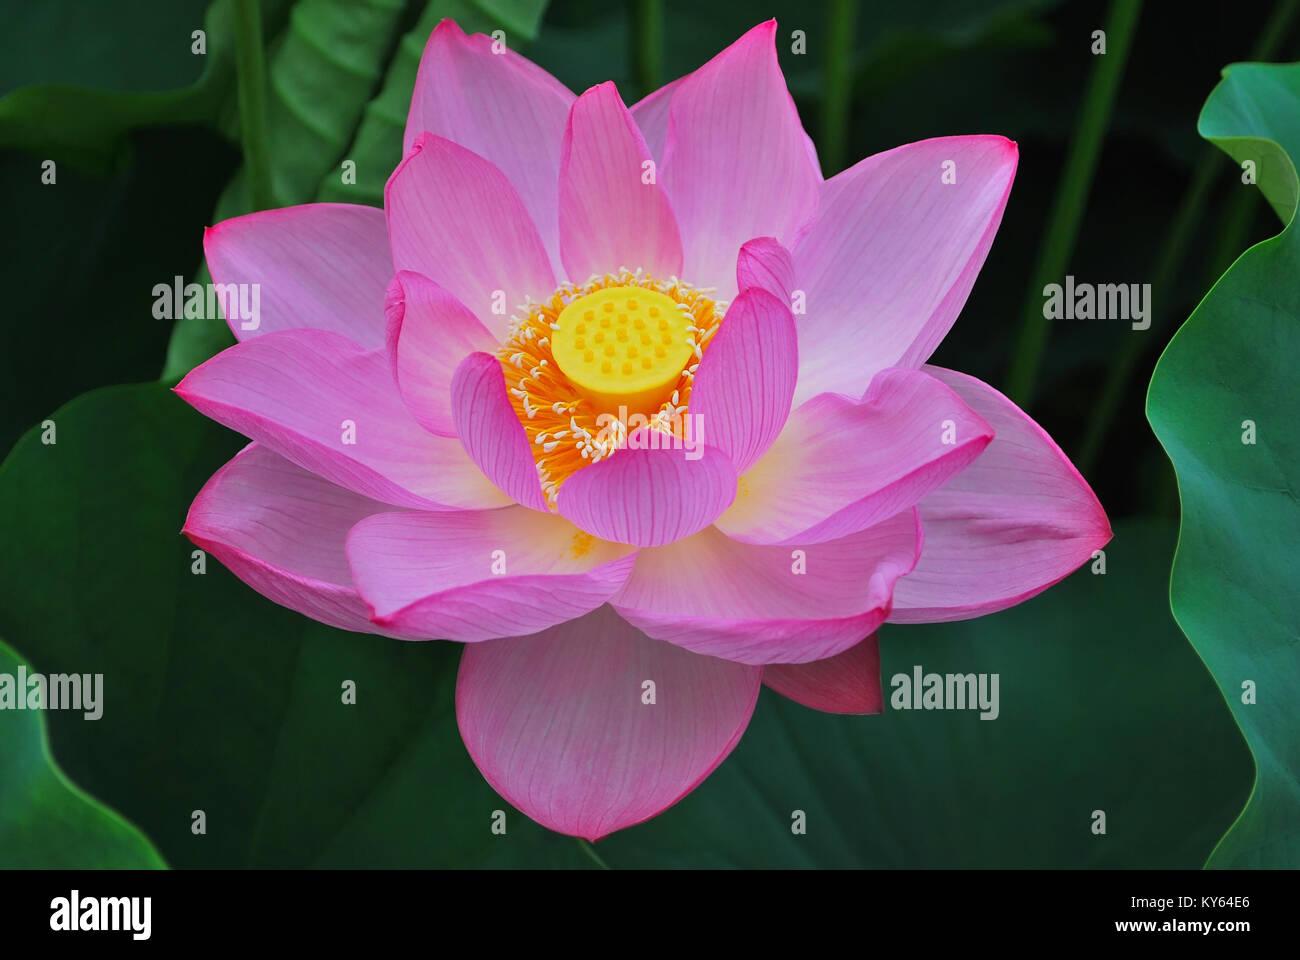 Lotus Flower In Full Bloom Symbolizing Religion Buddhism Purity